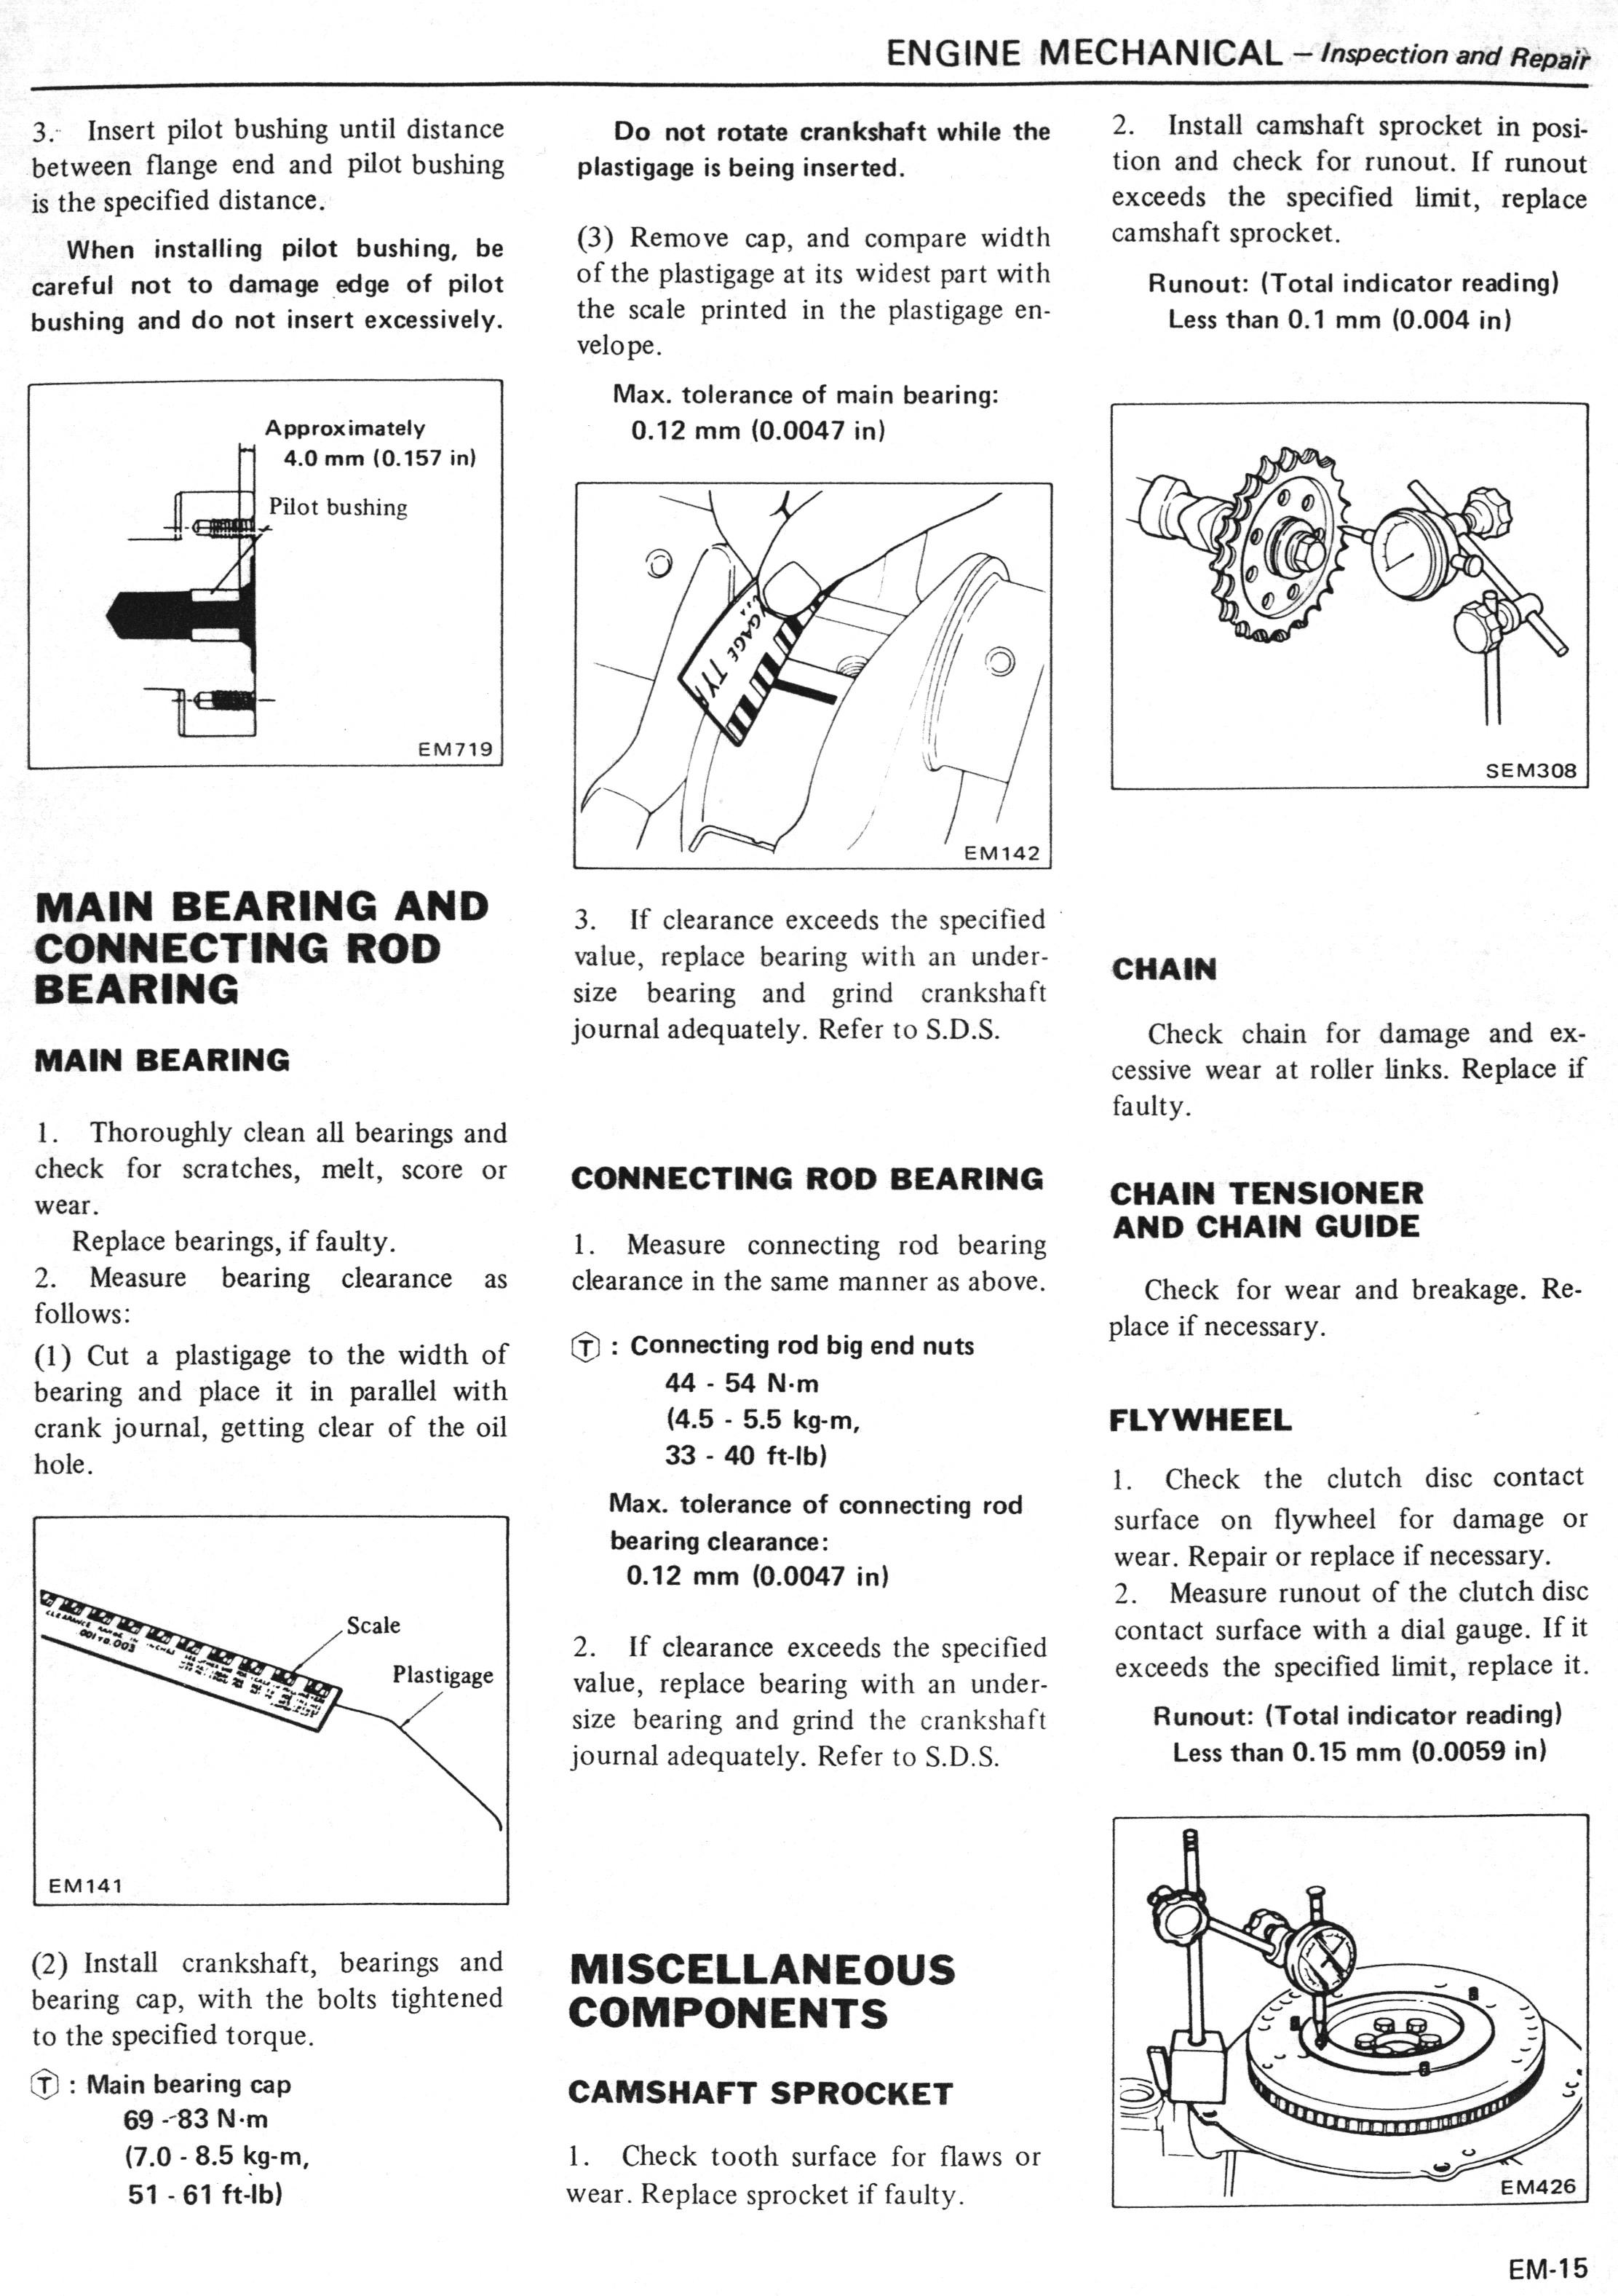 Nissan LD20 & LD28 Manual: Page EM-015